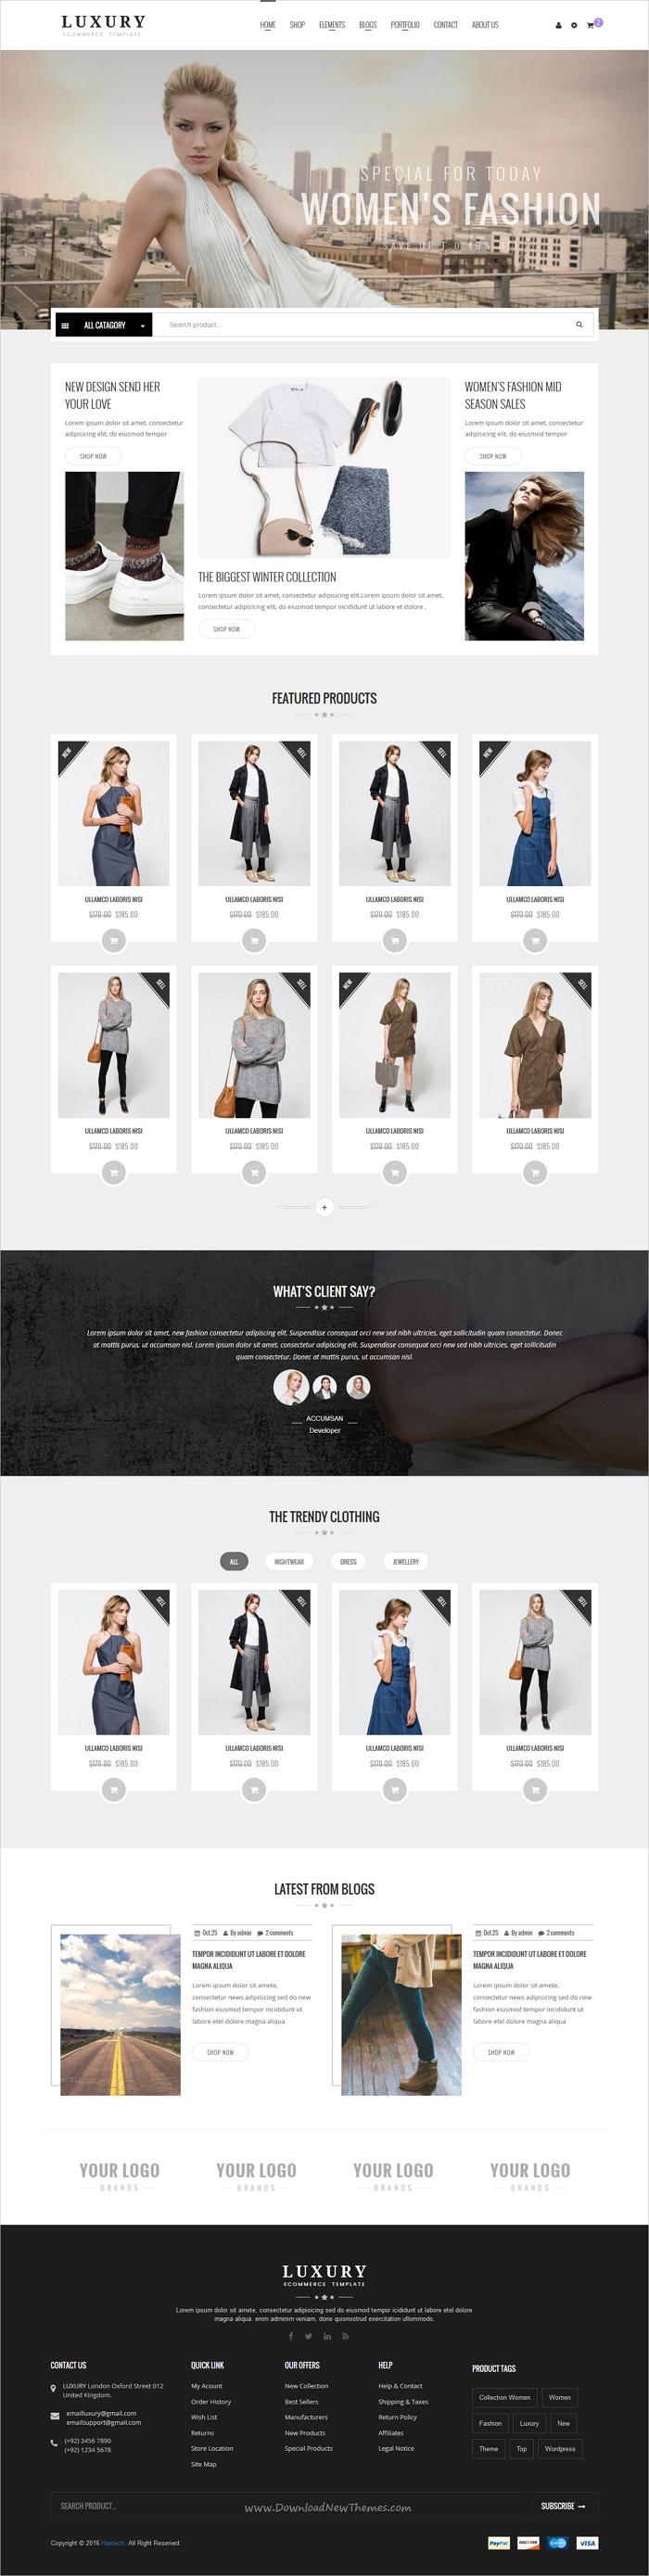 Luxury - eCommerce Fashion Template